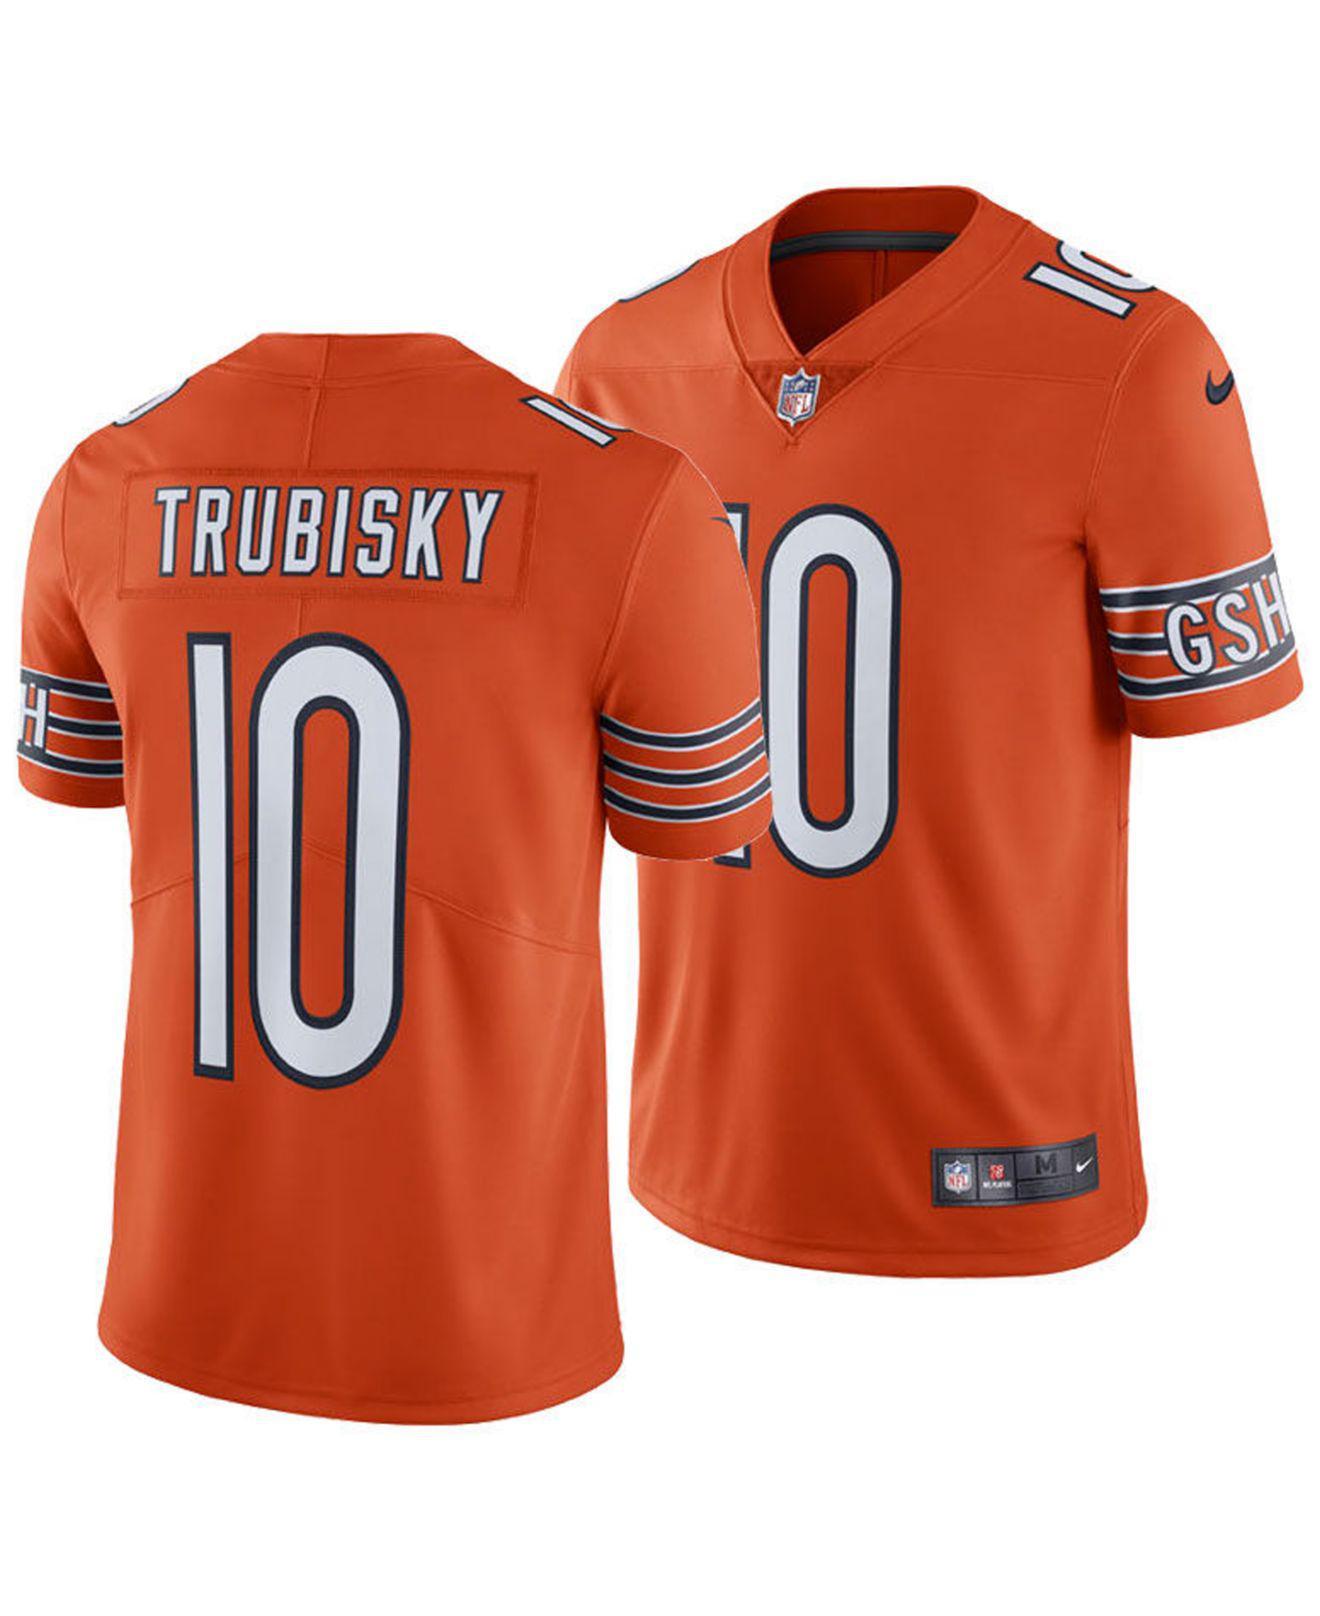 promo code bc21a 73b99 Men's Orange Mitchell Trubisky Chicago Bears Vapor Untouchable Limited  Jersey